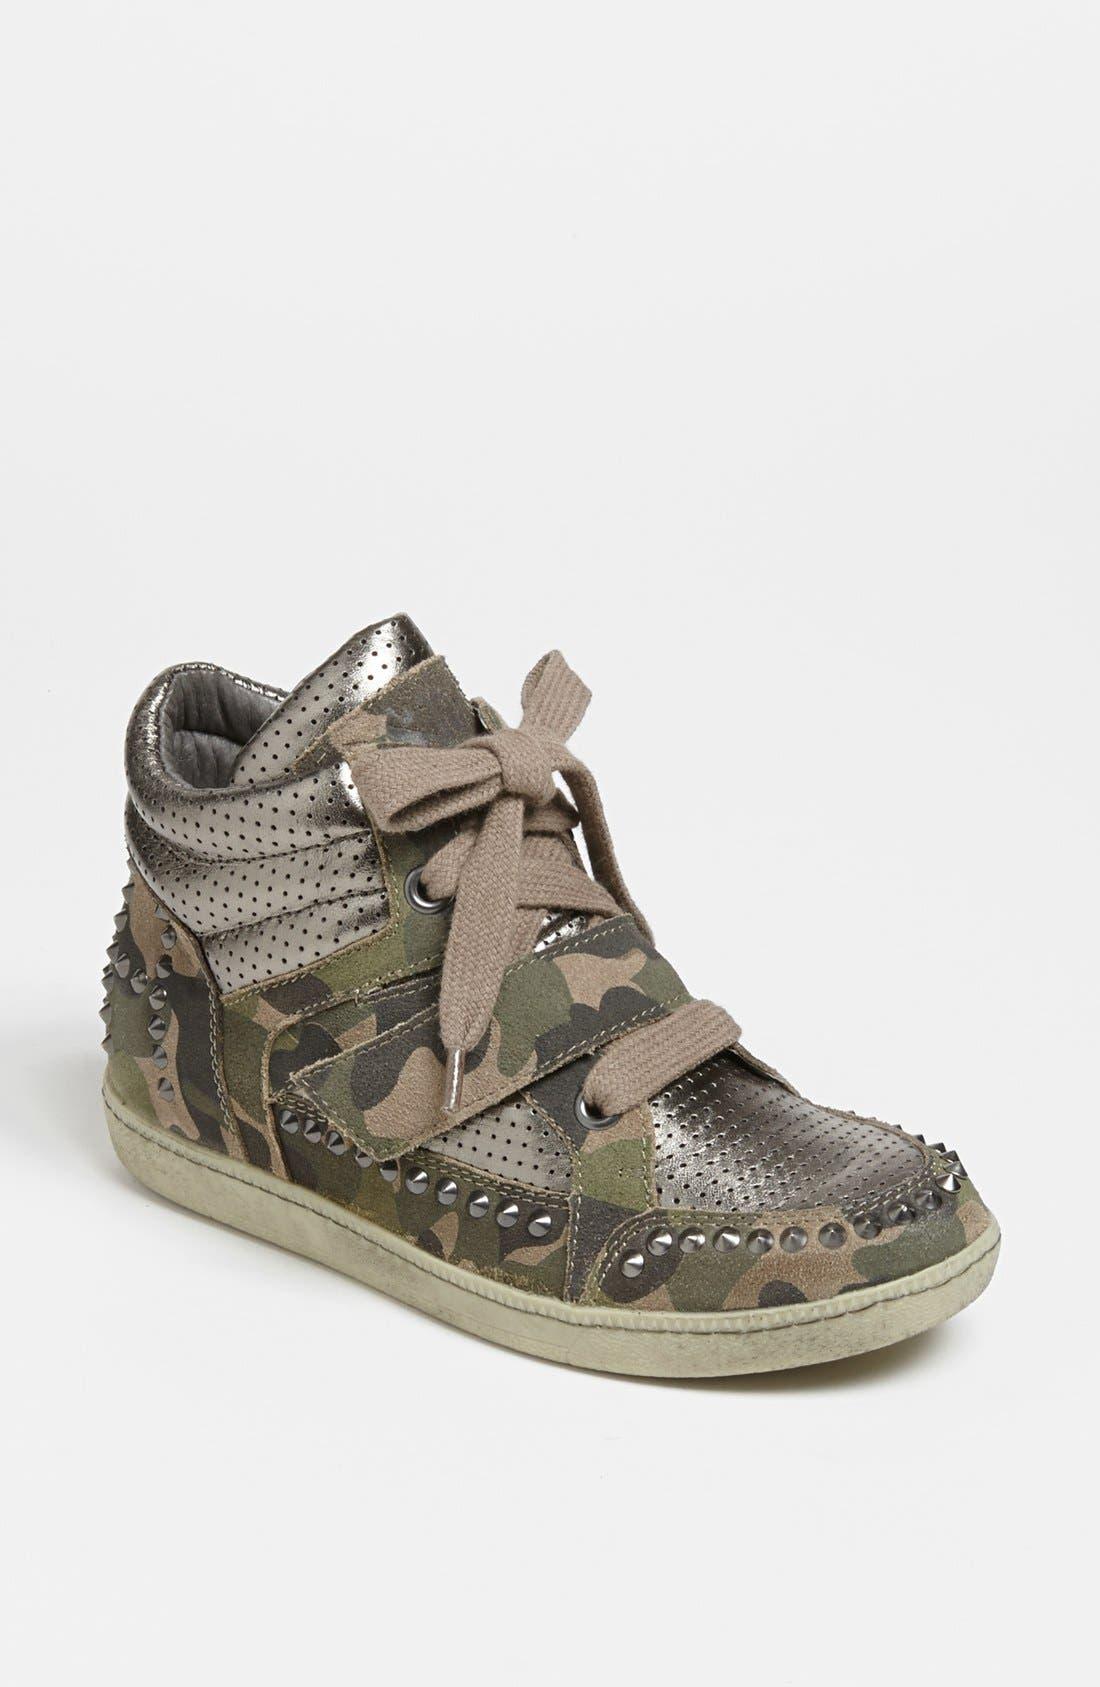 Main Image - Ash 'Zed' High Top Sneaker